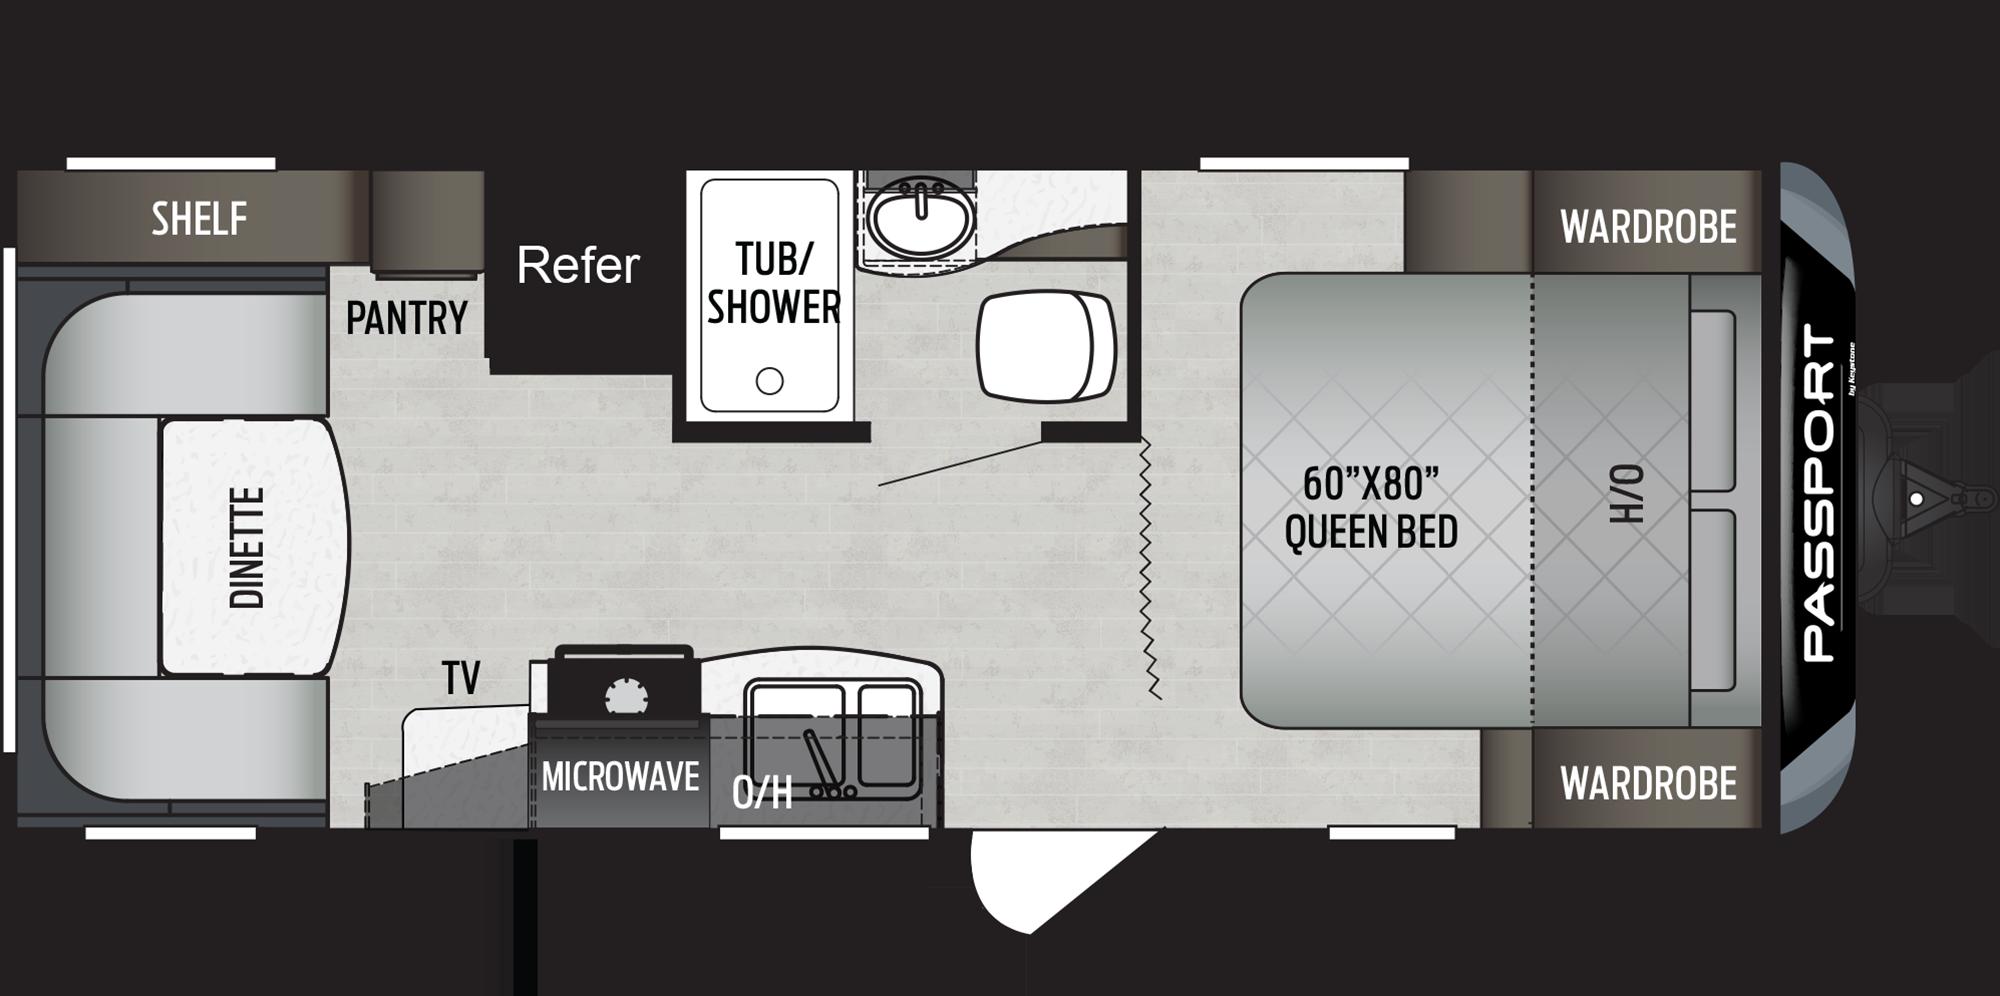 Passport Travel Trailers 234qbwe Floorplan Keystone Rv Travel Trailer Floor Plans Travel Trailer Floor Plans